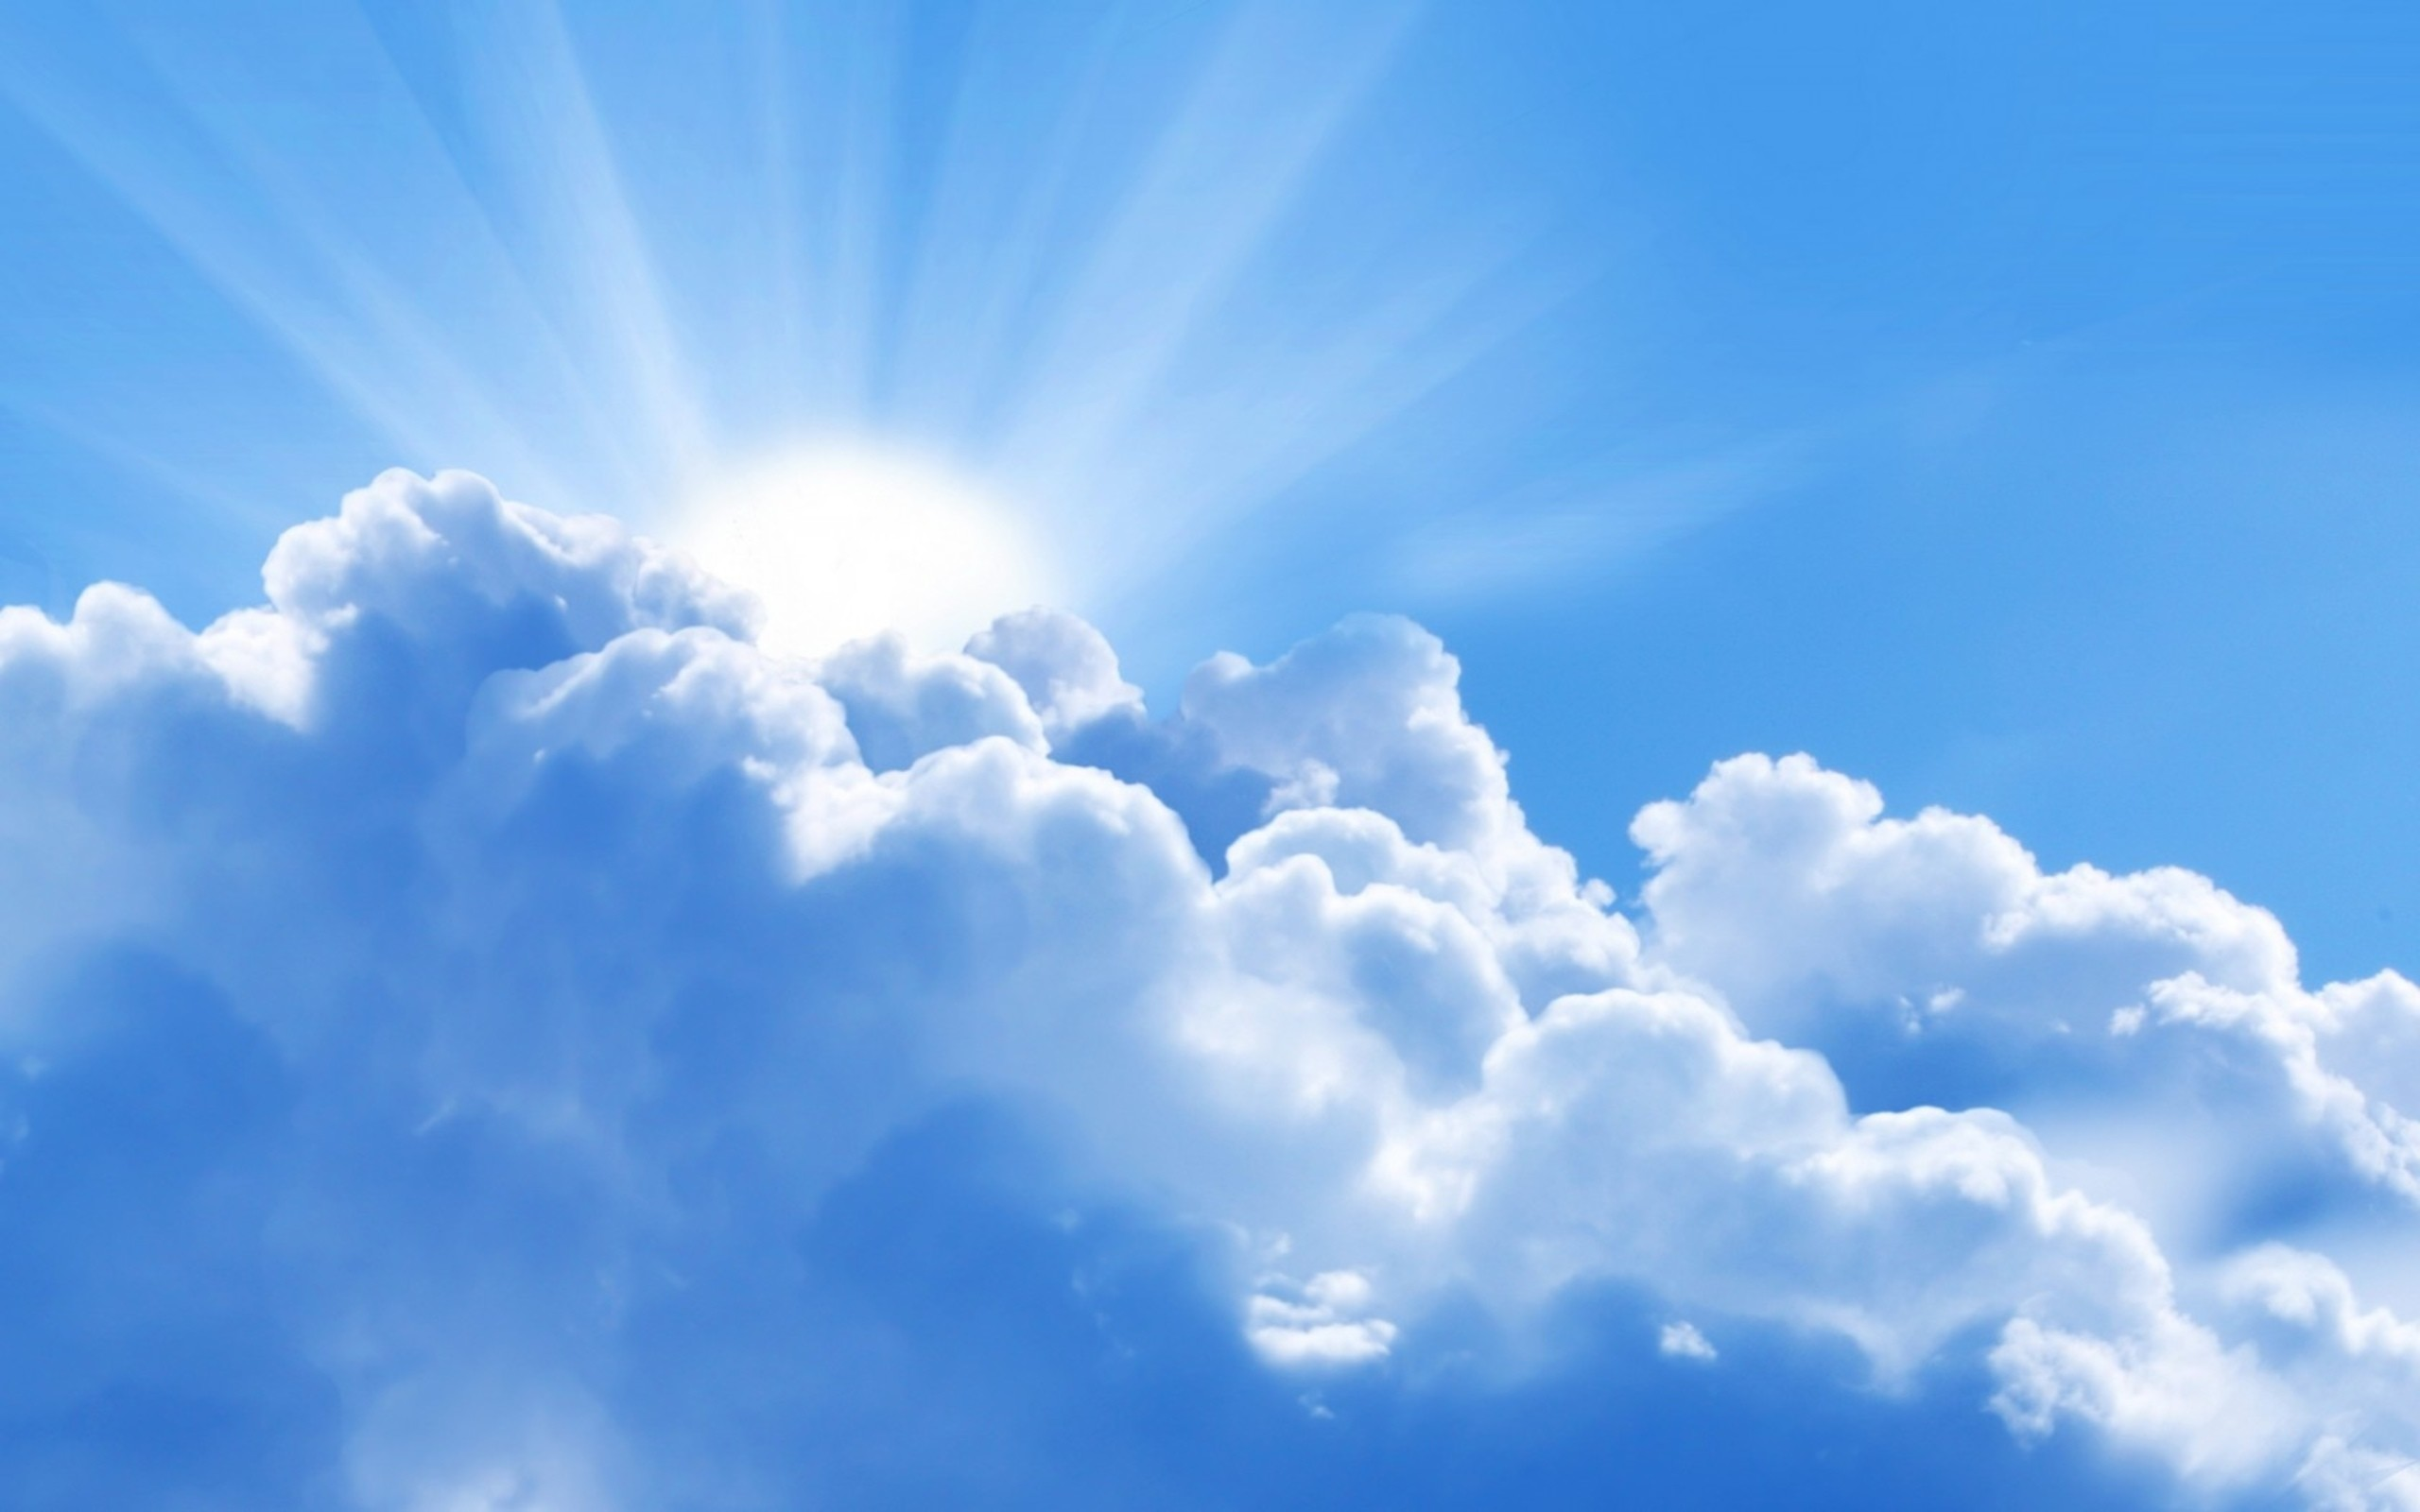 Clouds Blue Sky Background #1810